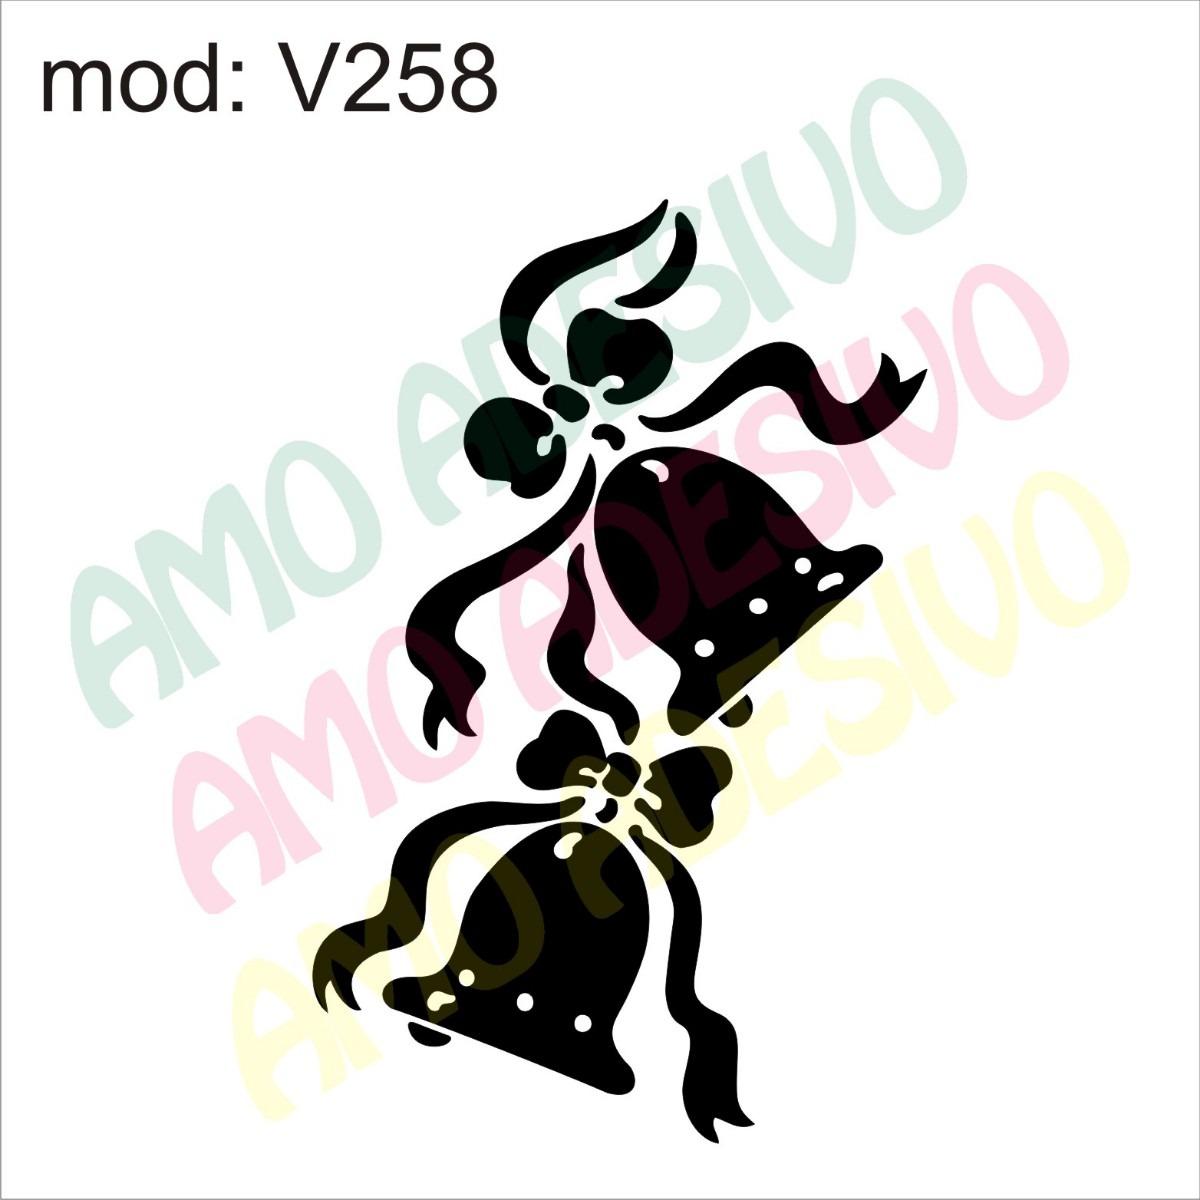 adesivo v258 desenho abstrato sino natal laço toca sino r 87 26